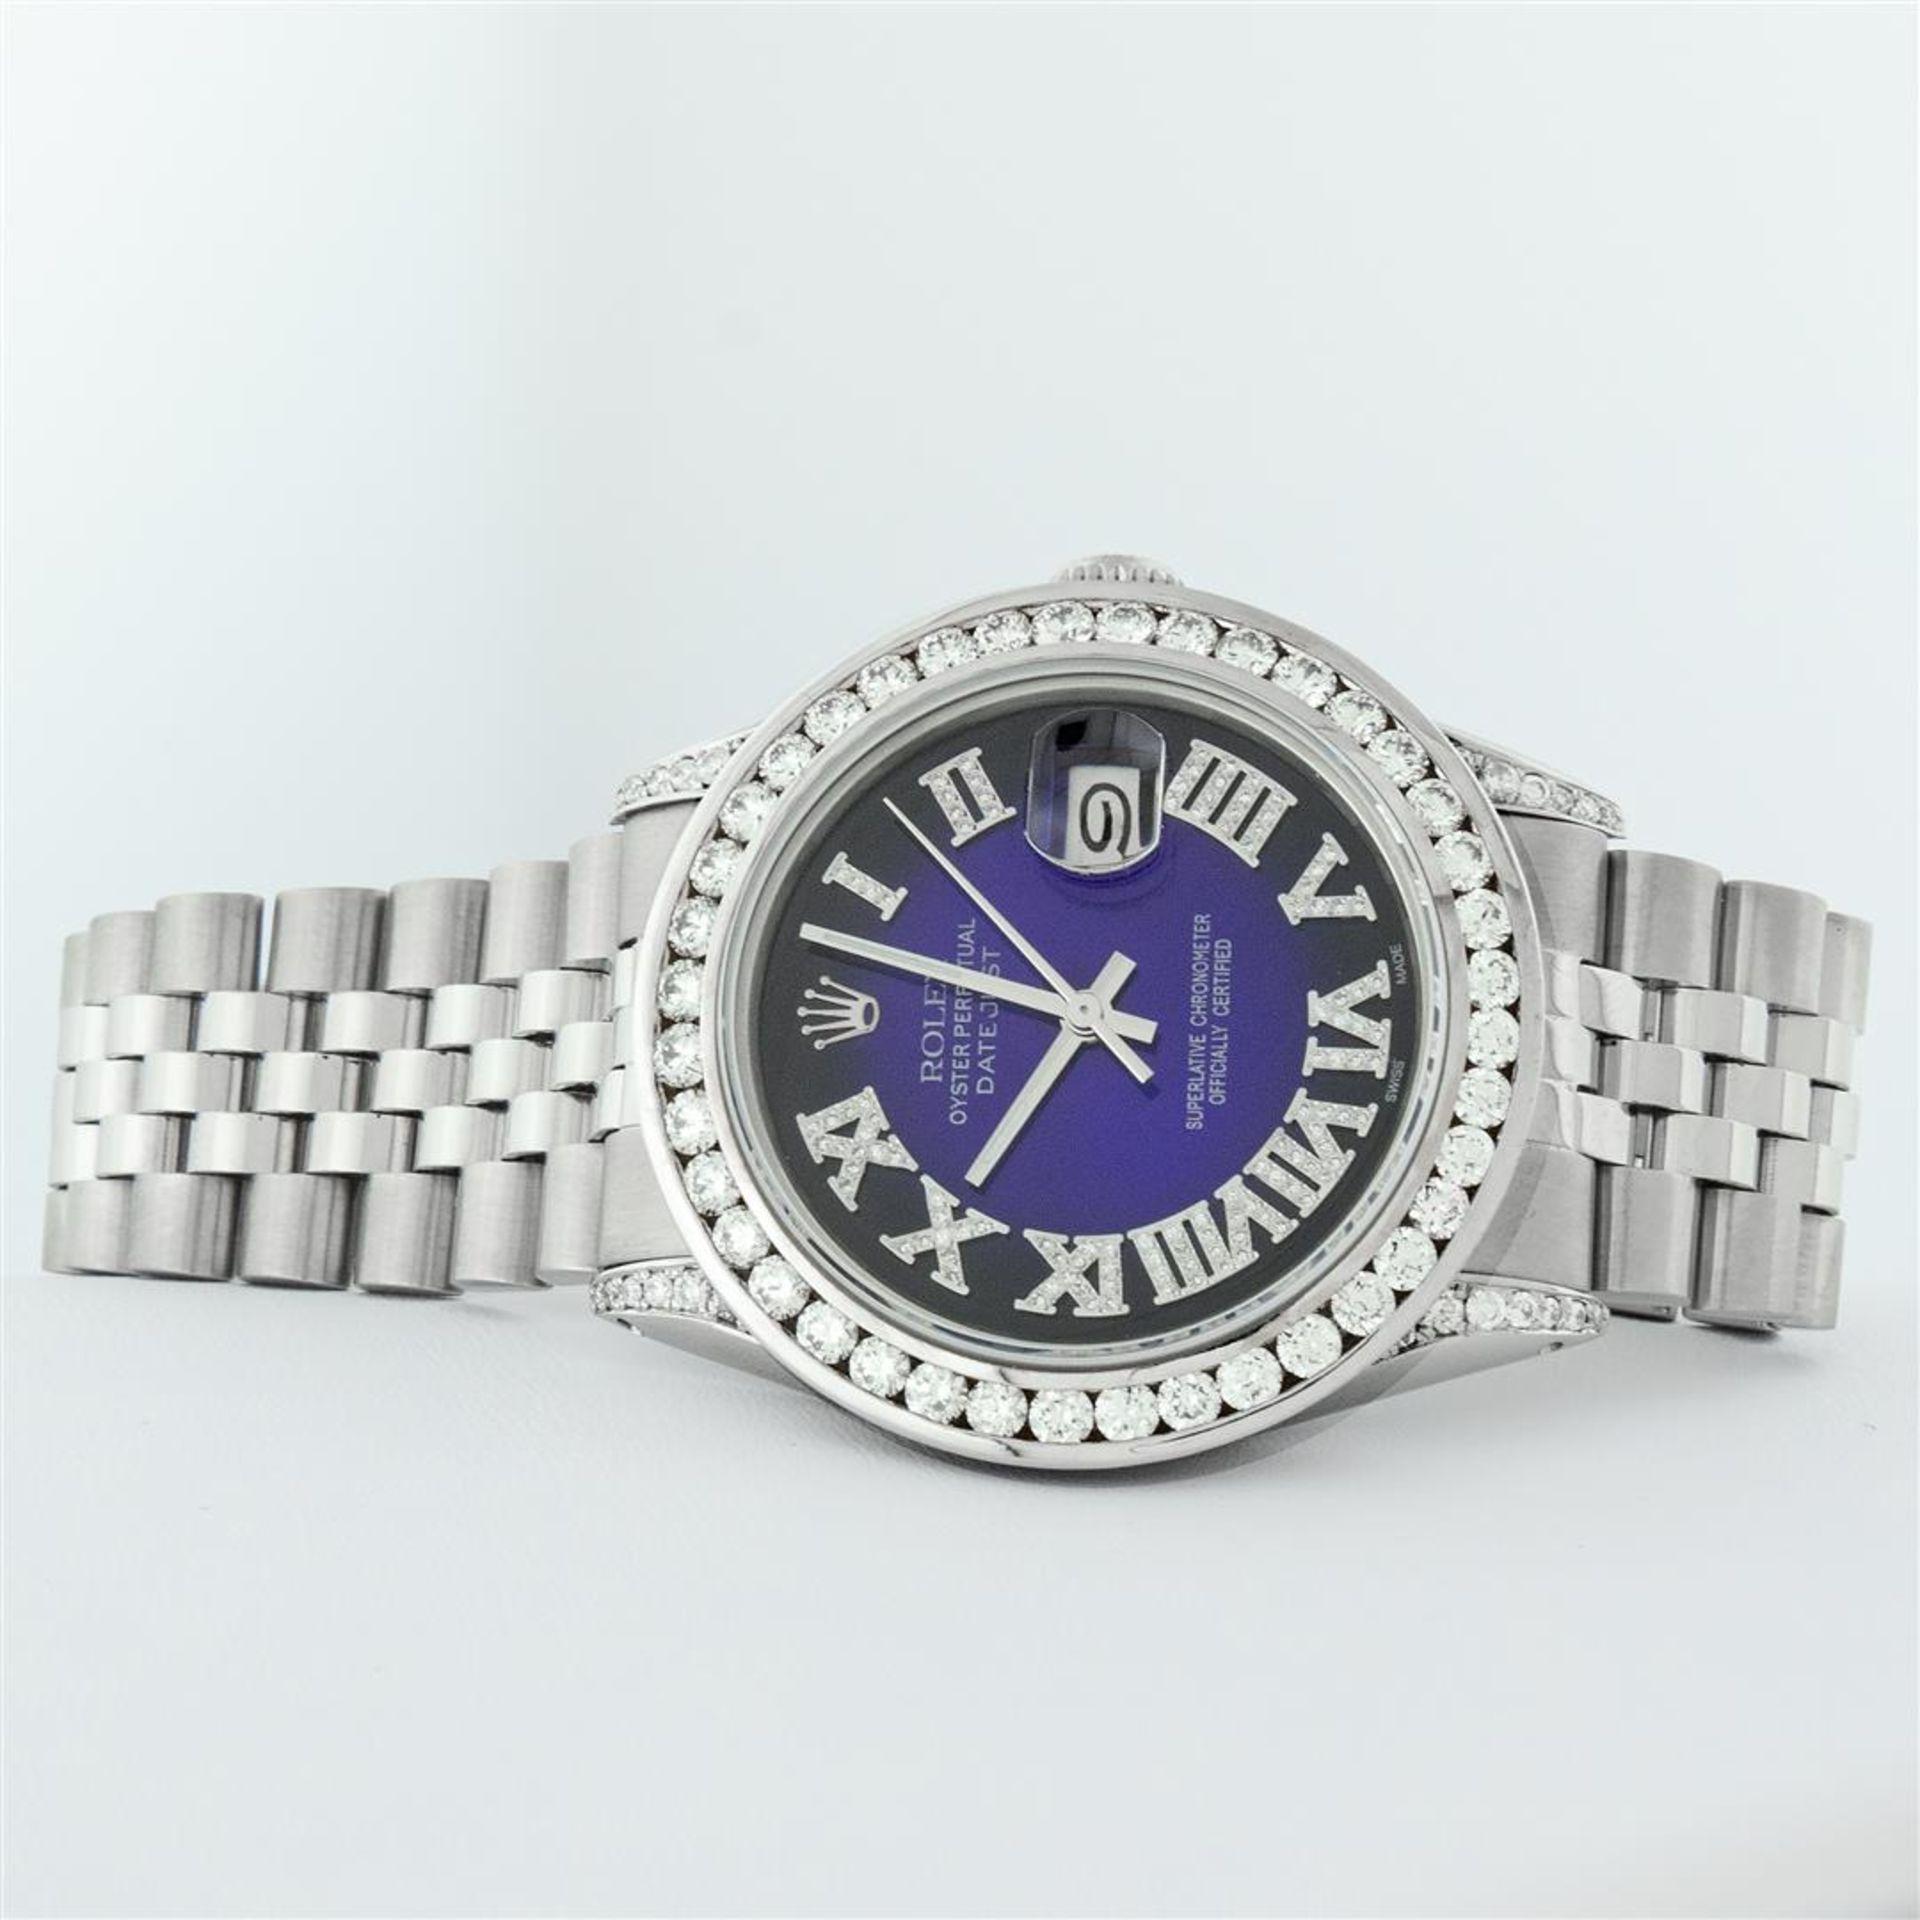 Rolex Mens Stainless Steel Blue Vignette Roman 3ctw Diamond Datejust Wristwatch - Image 7 of 9